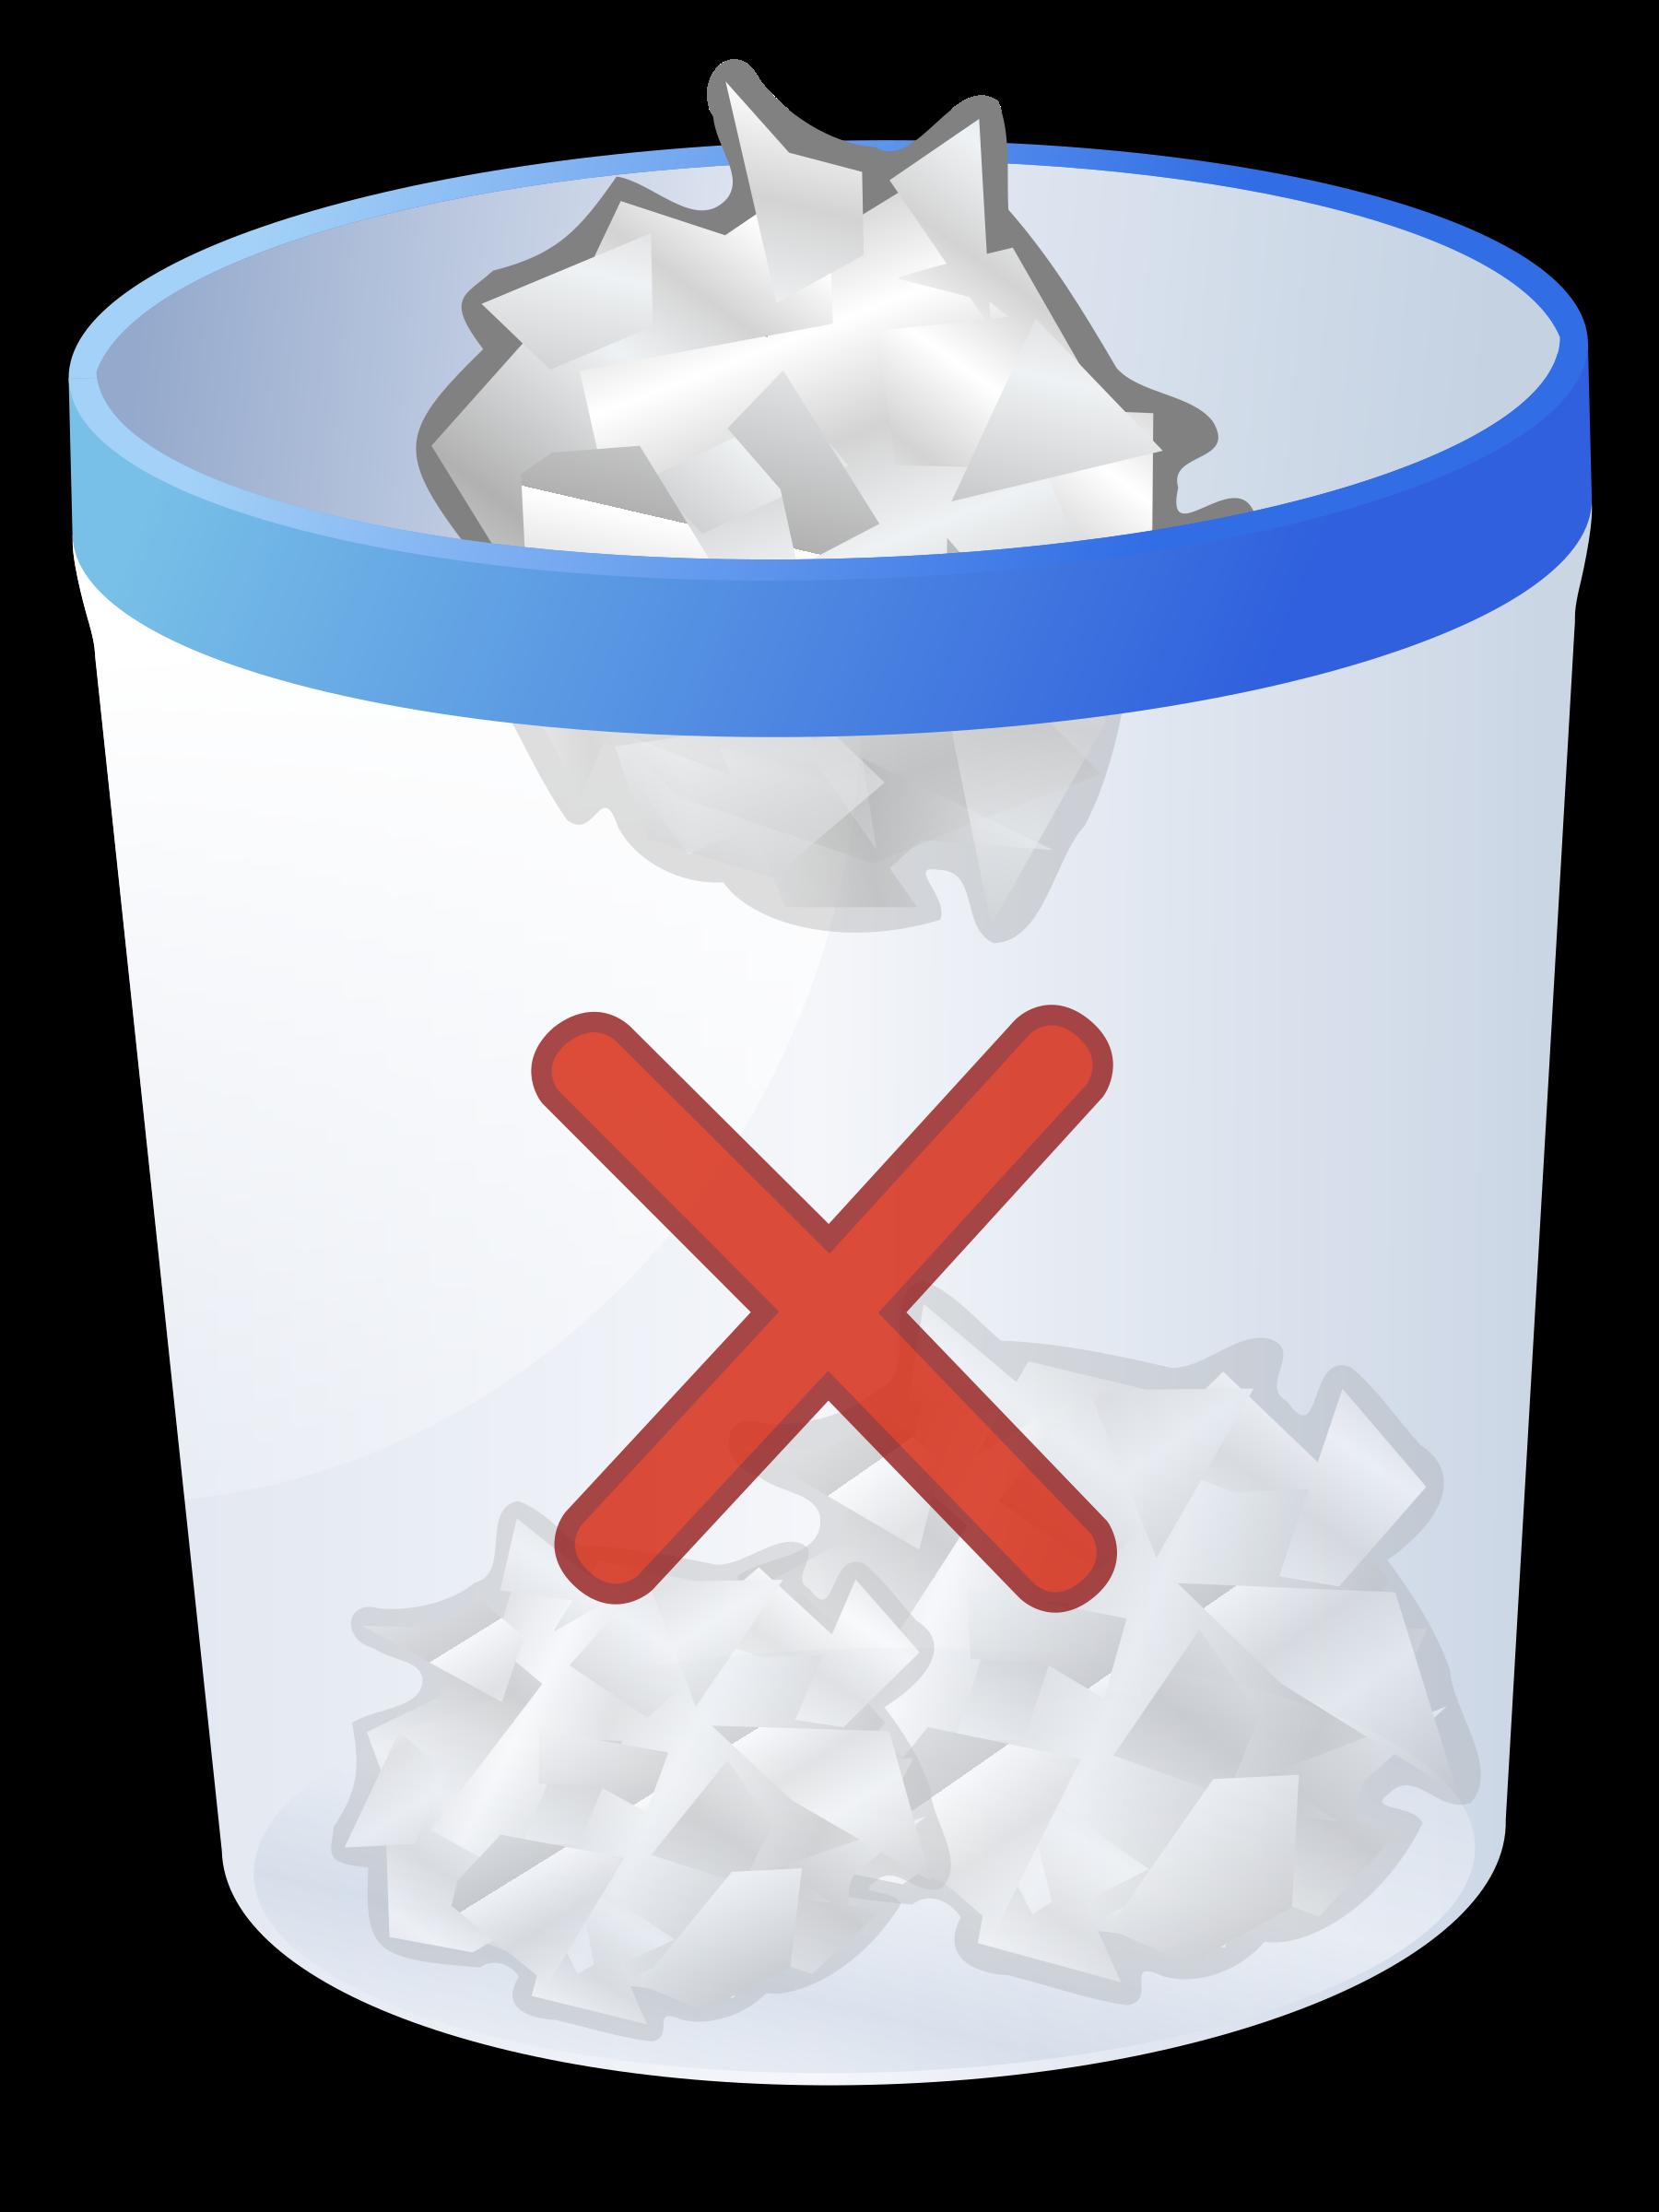 Garbage clipart cartoon. Trash bins big image